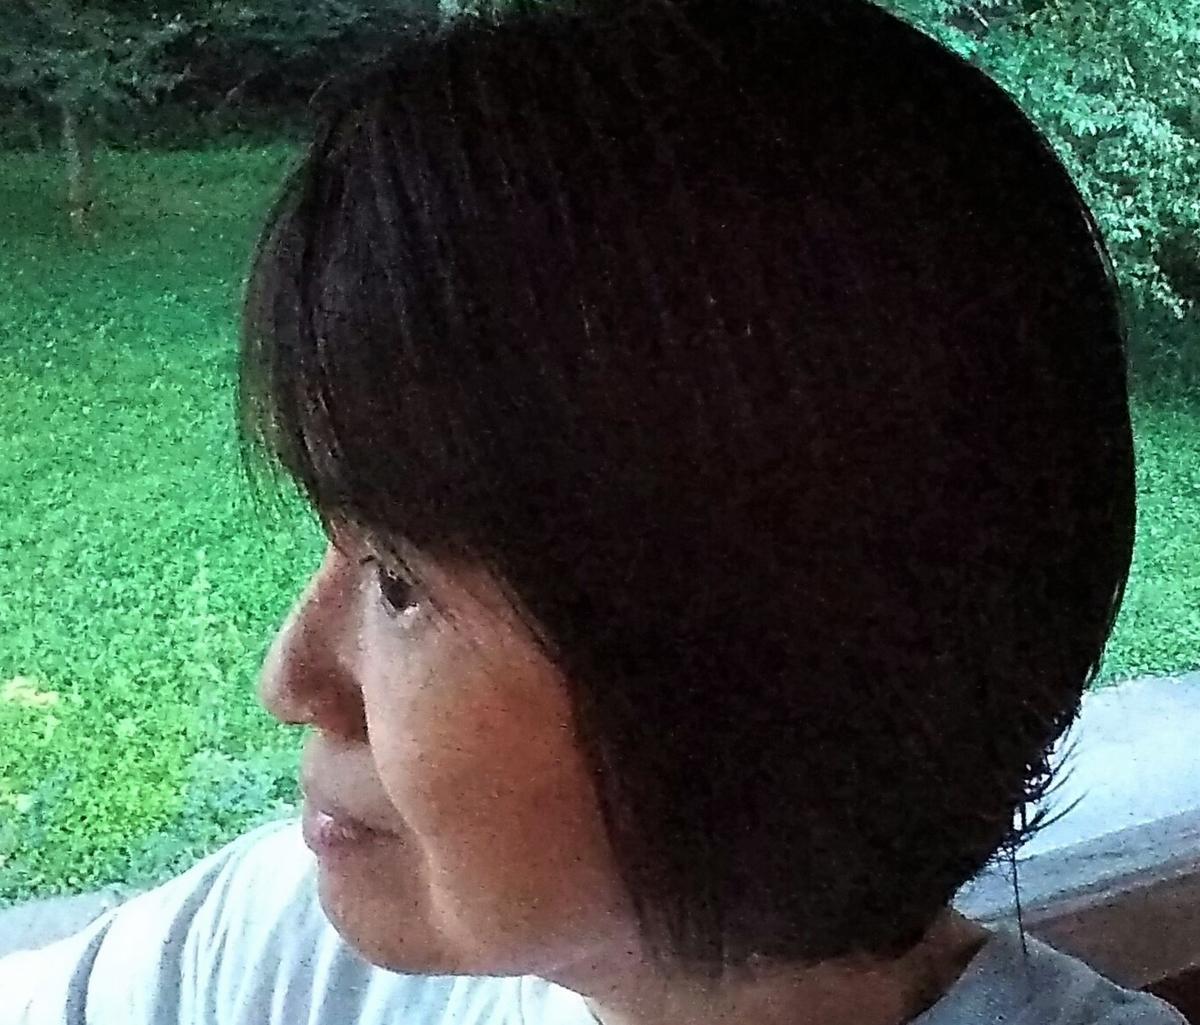 f:id:hmokuyobi:20200801173609j:plain